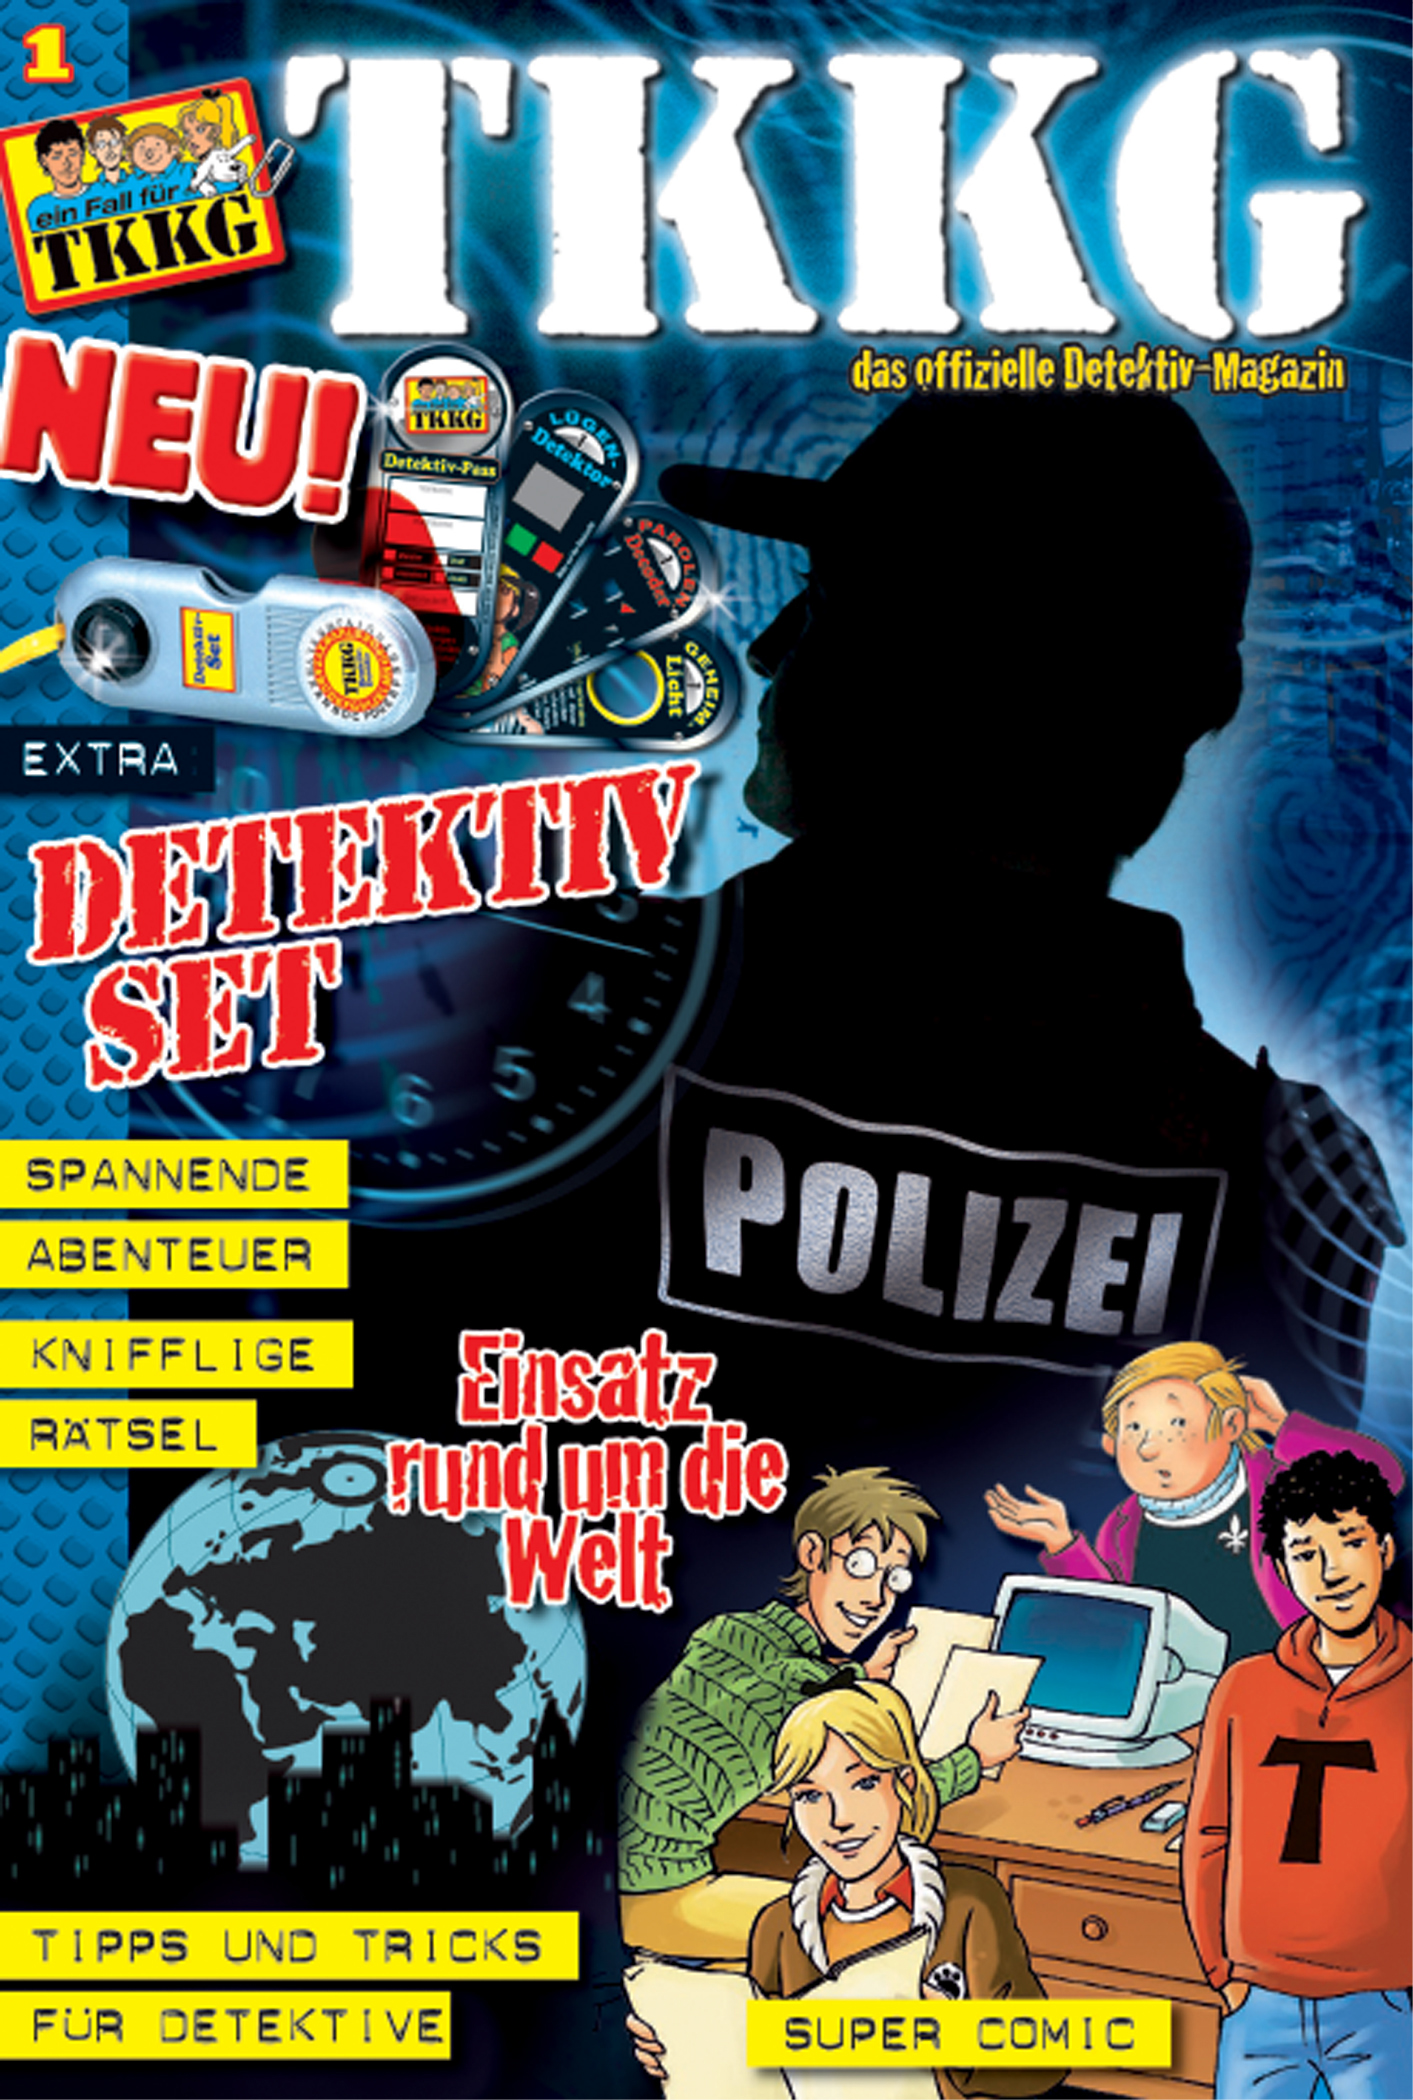 Egmont Ehapa Launcht Toy Story Magazin: Meister-Schnüffler Aufgepasst! / Egmont Ehapa Launcht